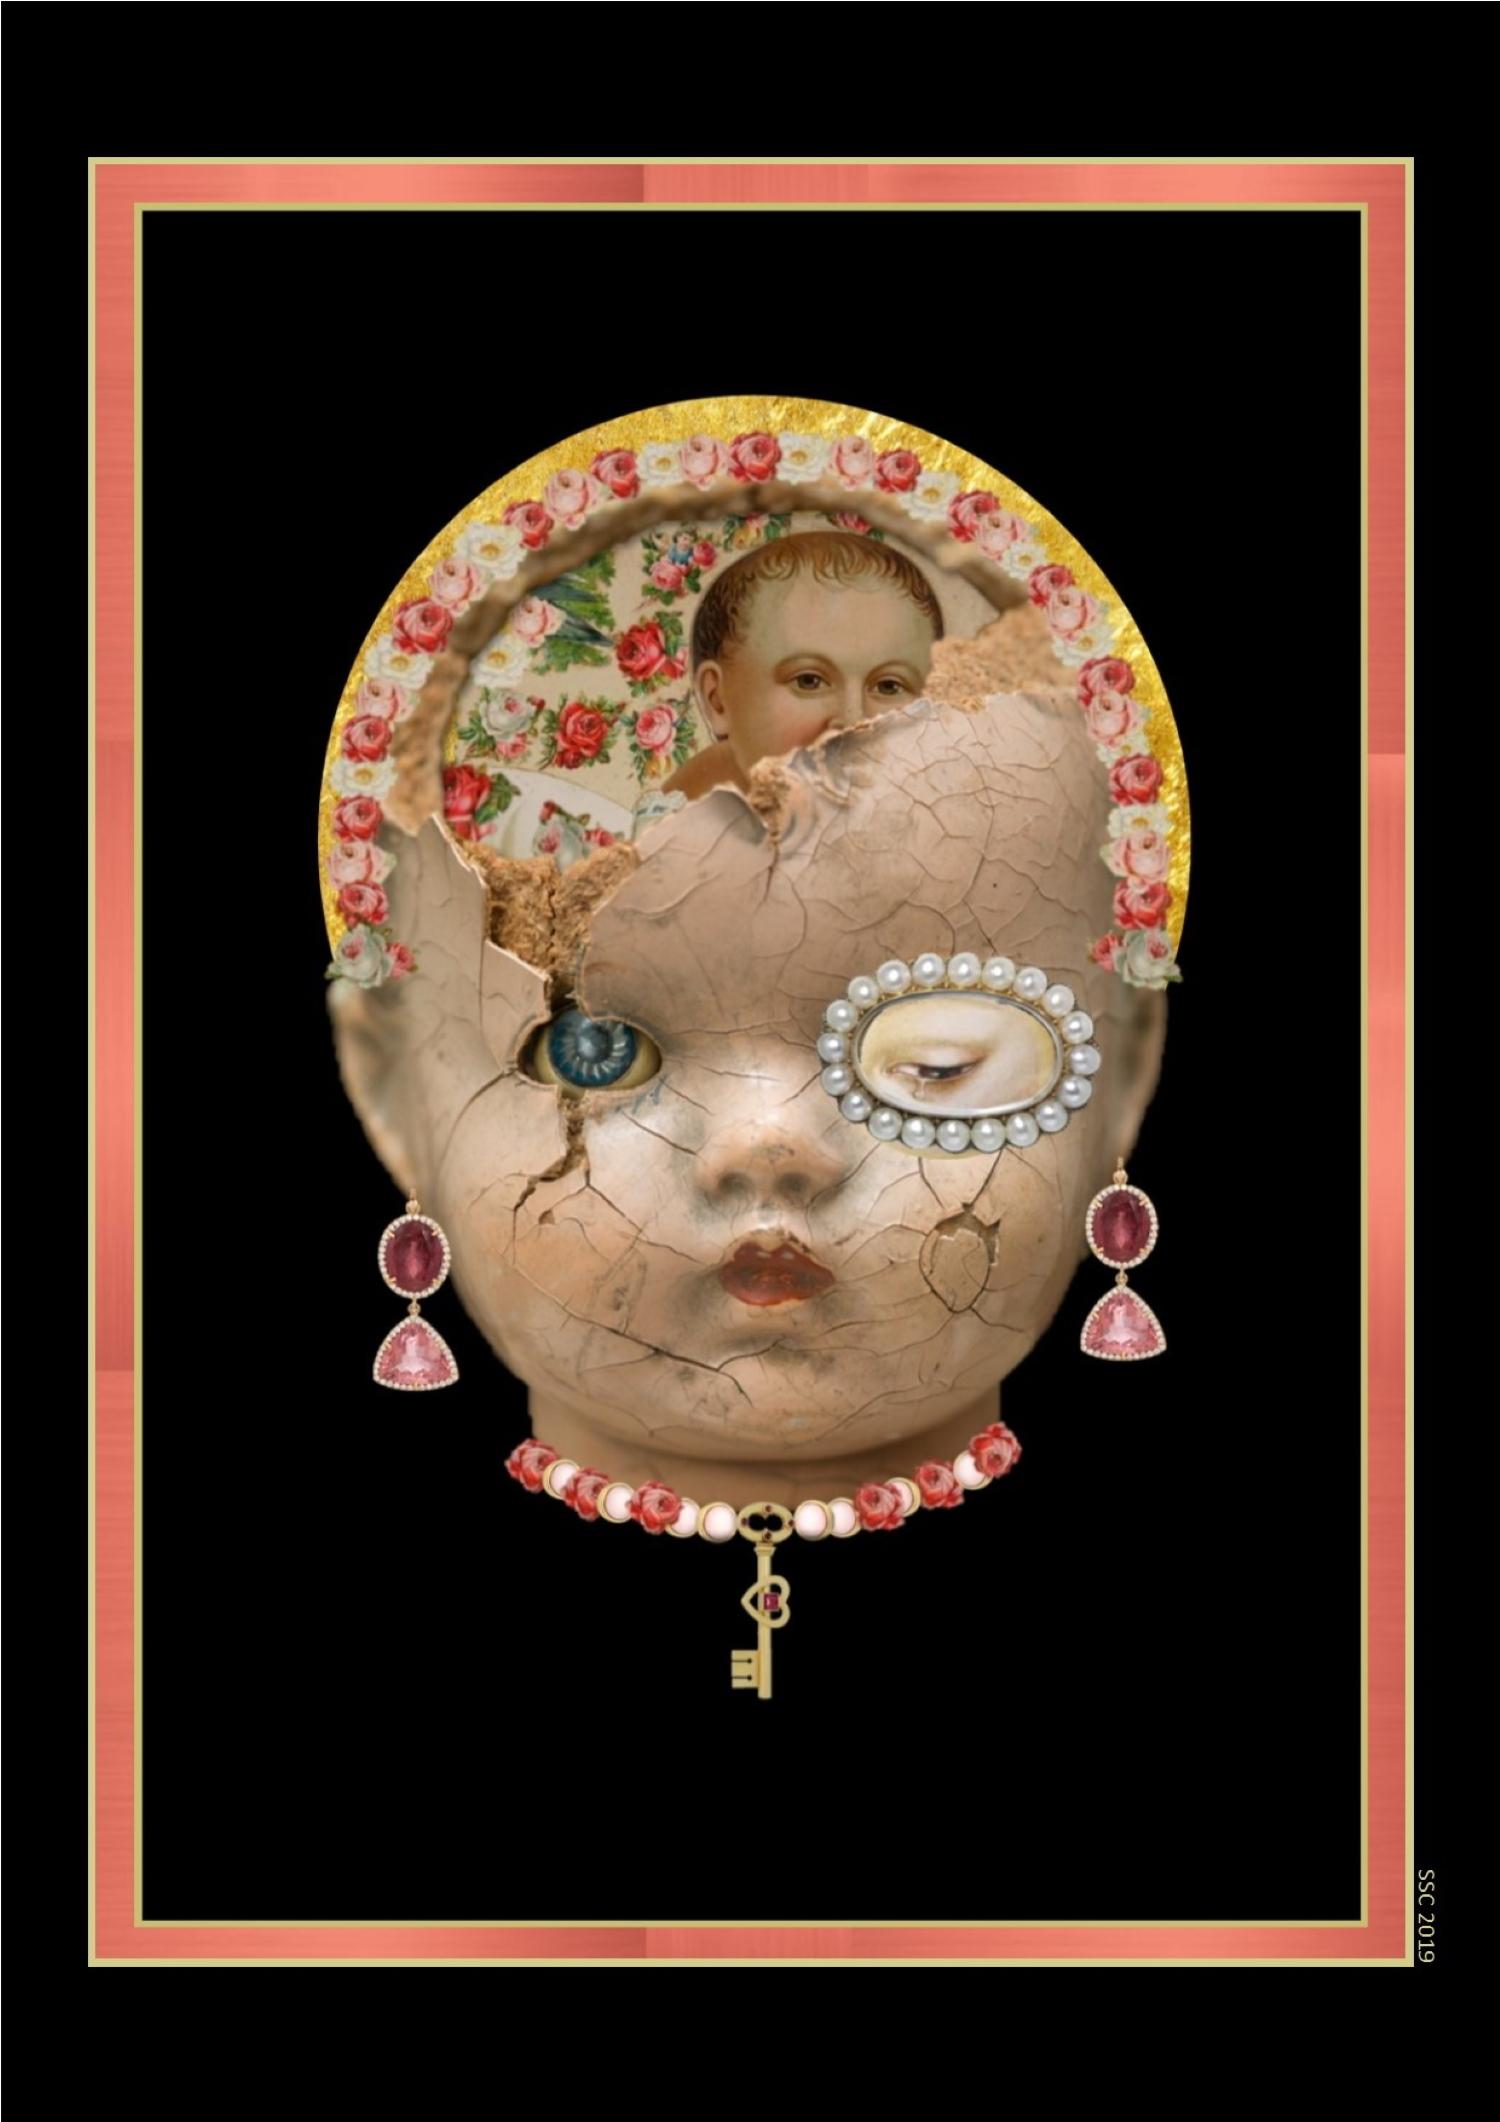 Dollface, (c) Sasha Saben Callaghan 2019.